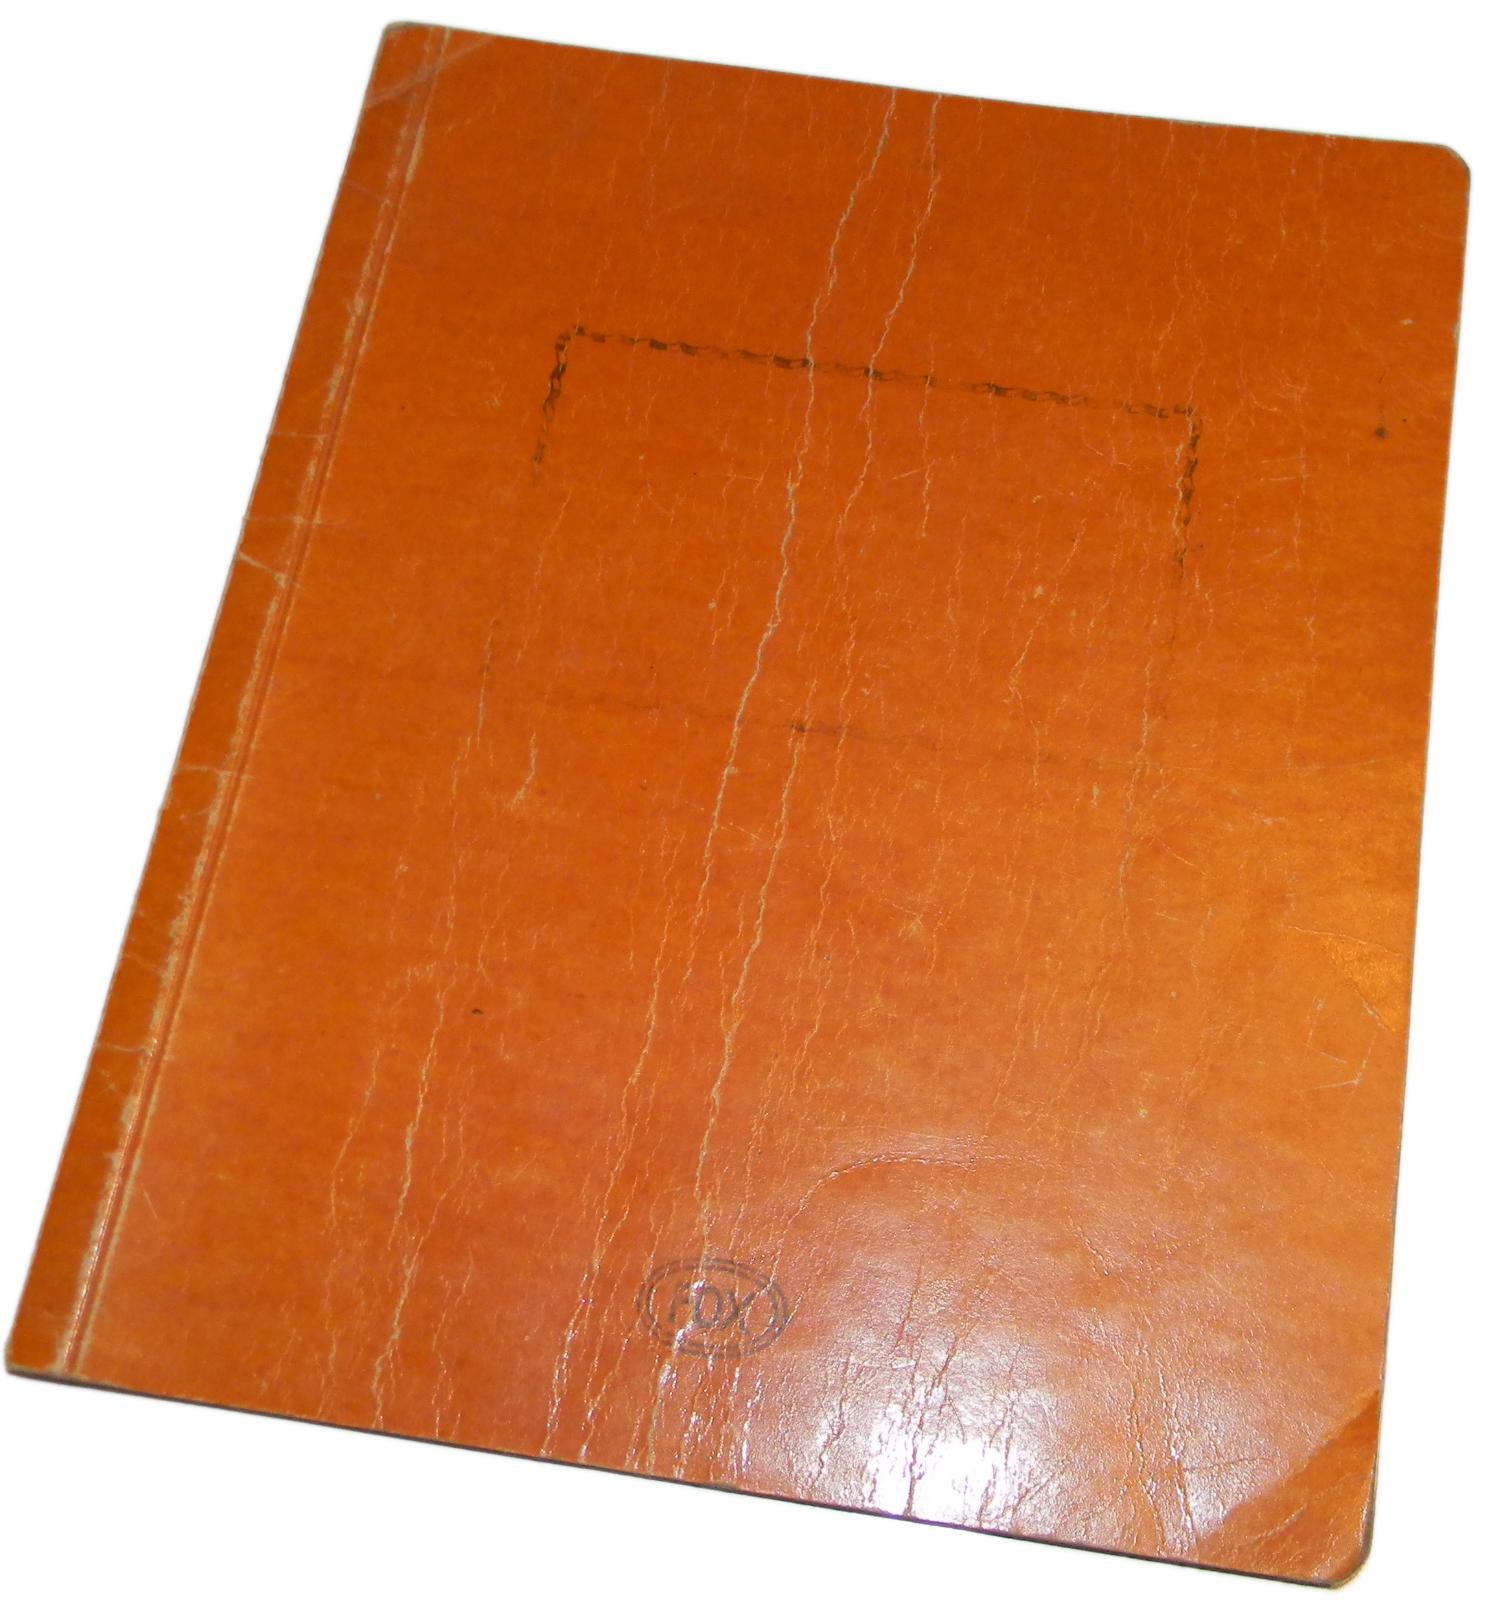 LW observers notebook